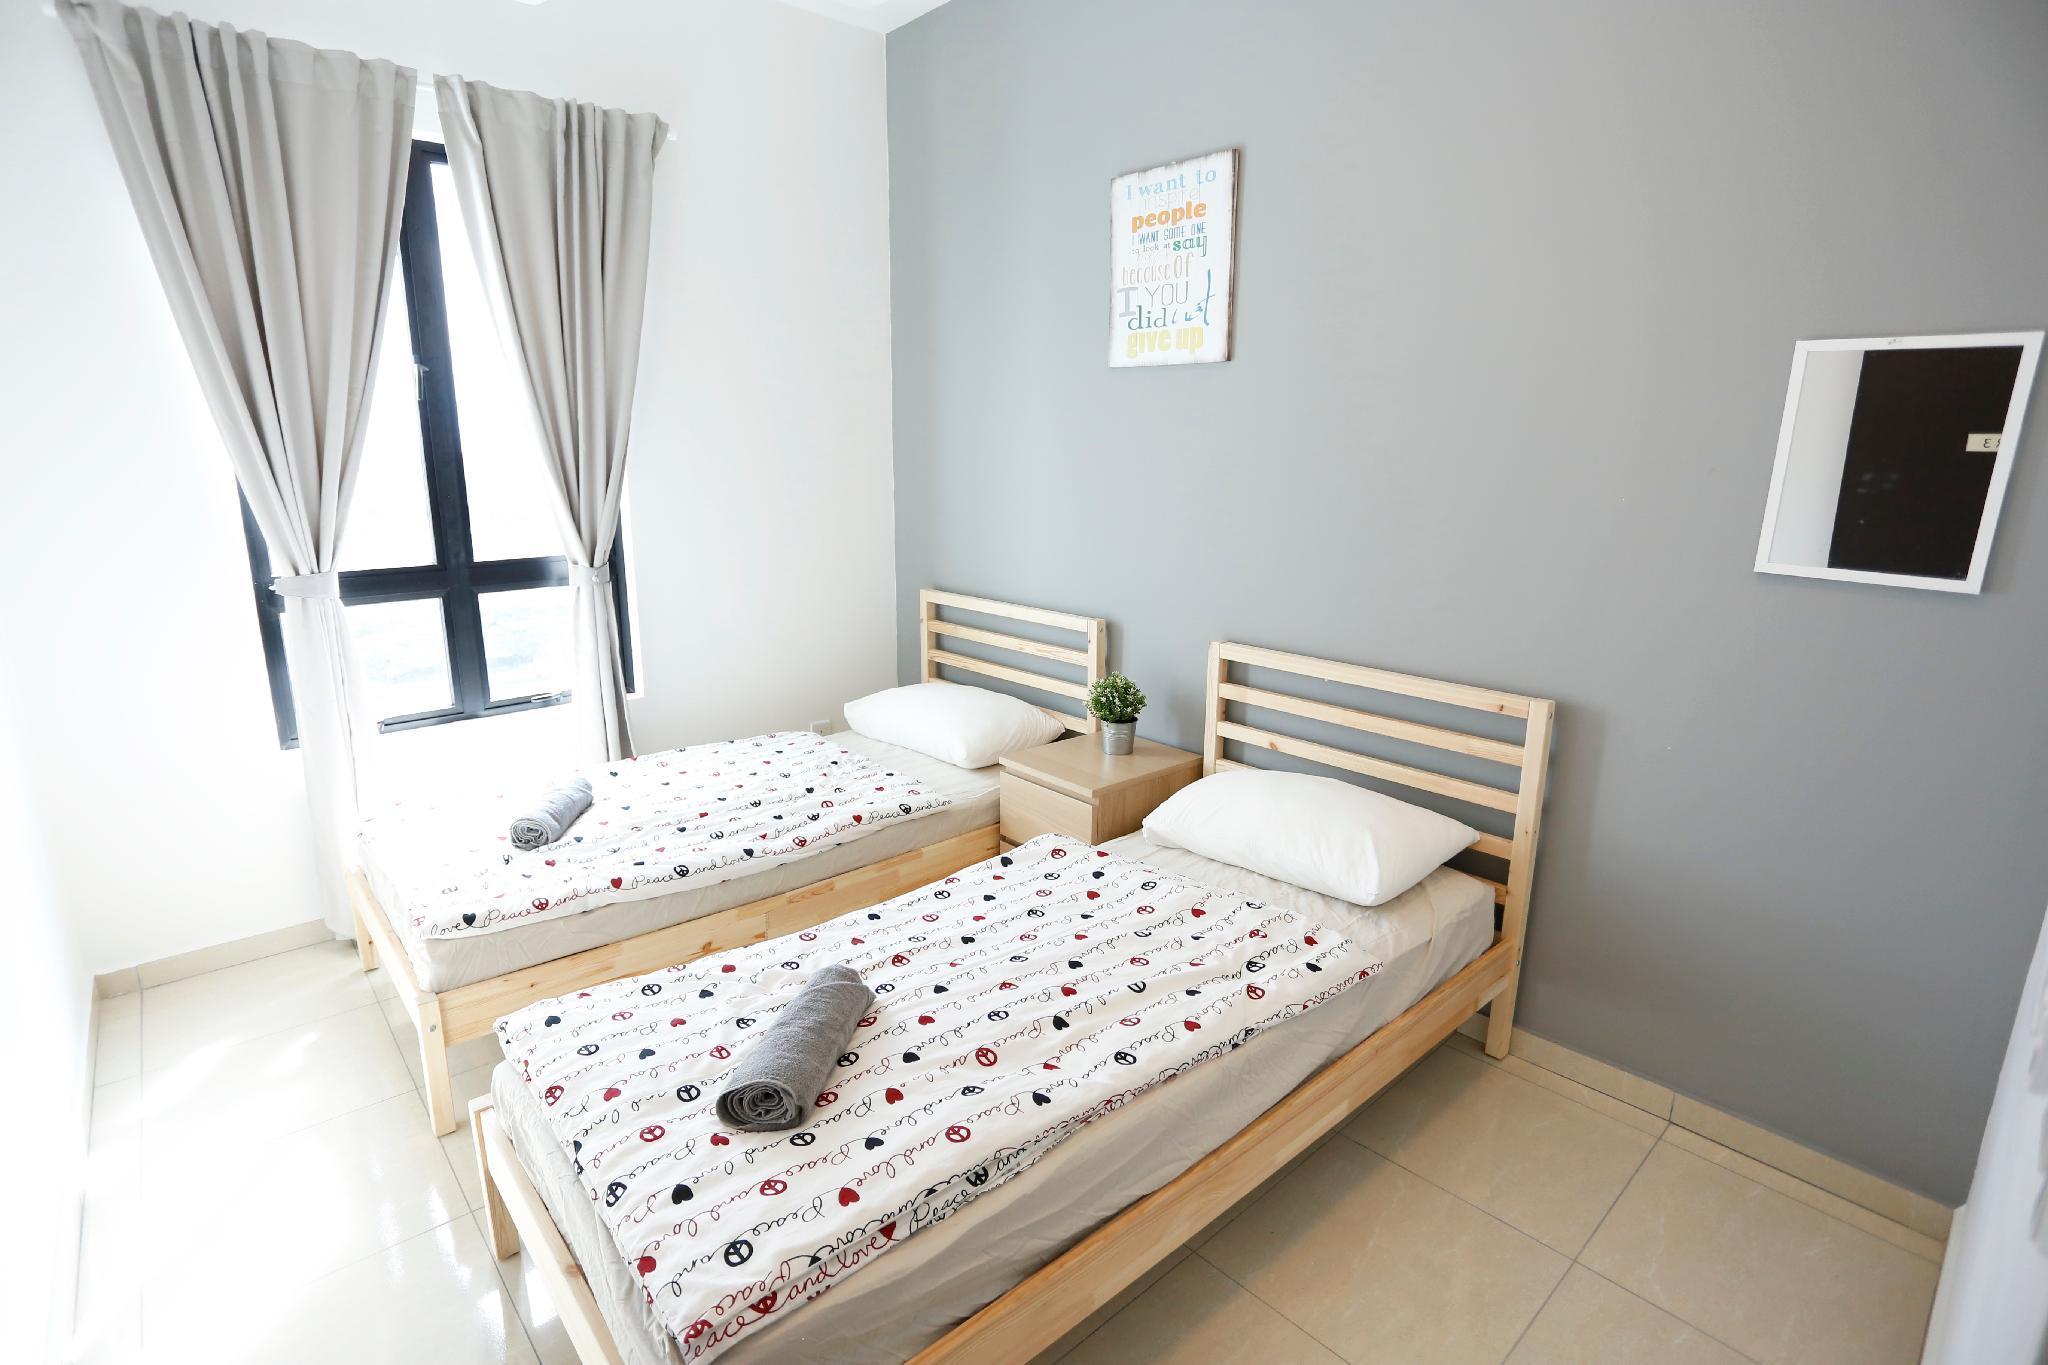 Desire Share Room At JB Busniess Vacation 1501 R3